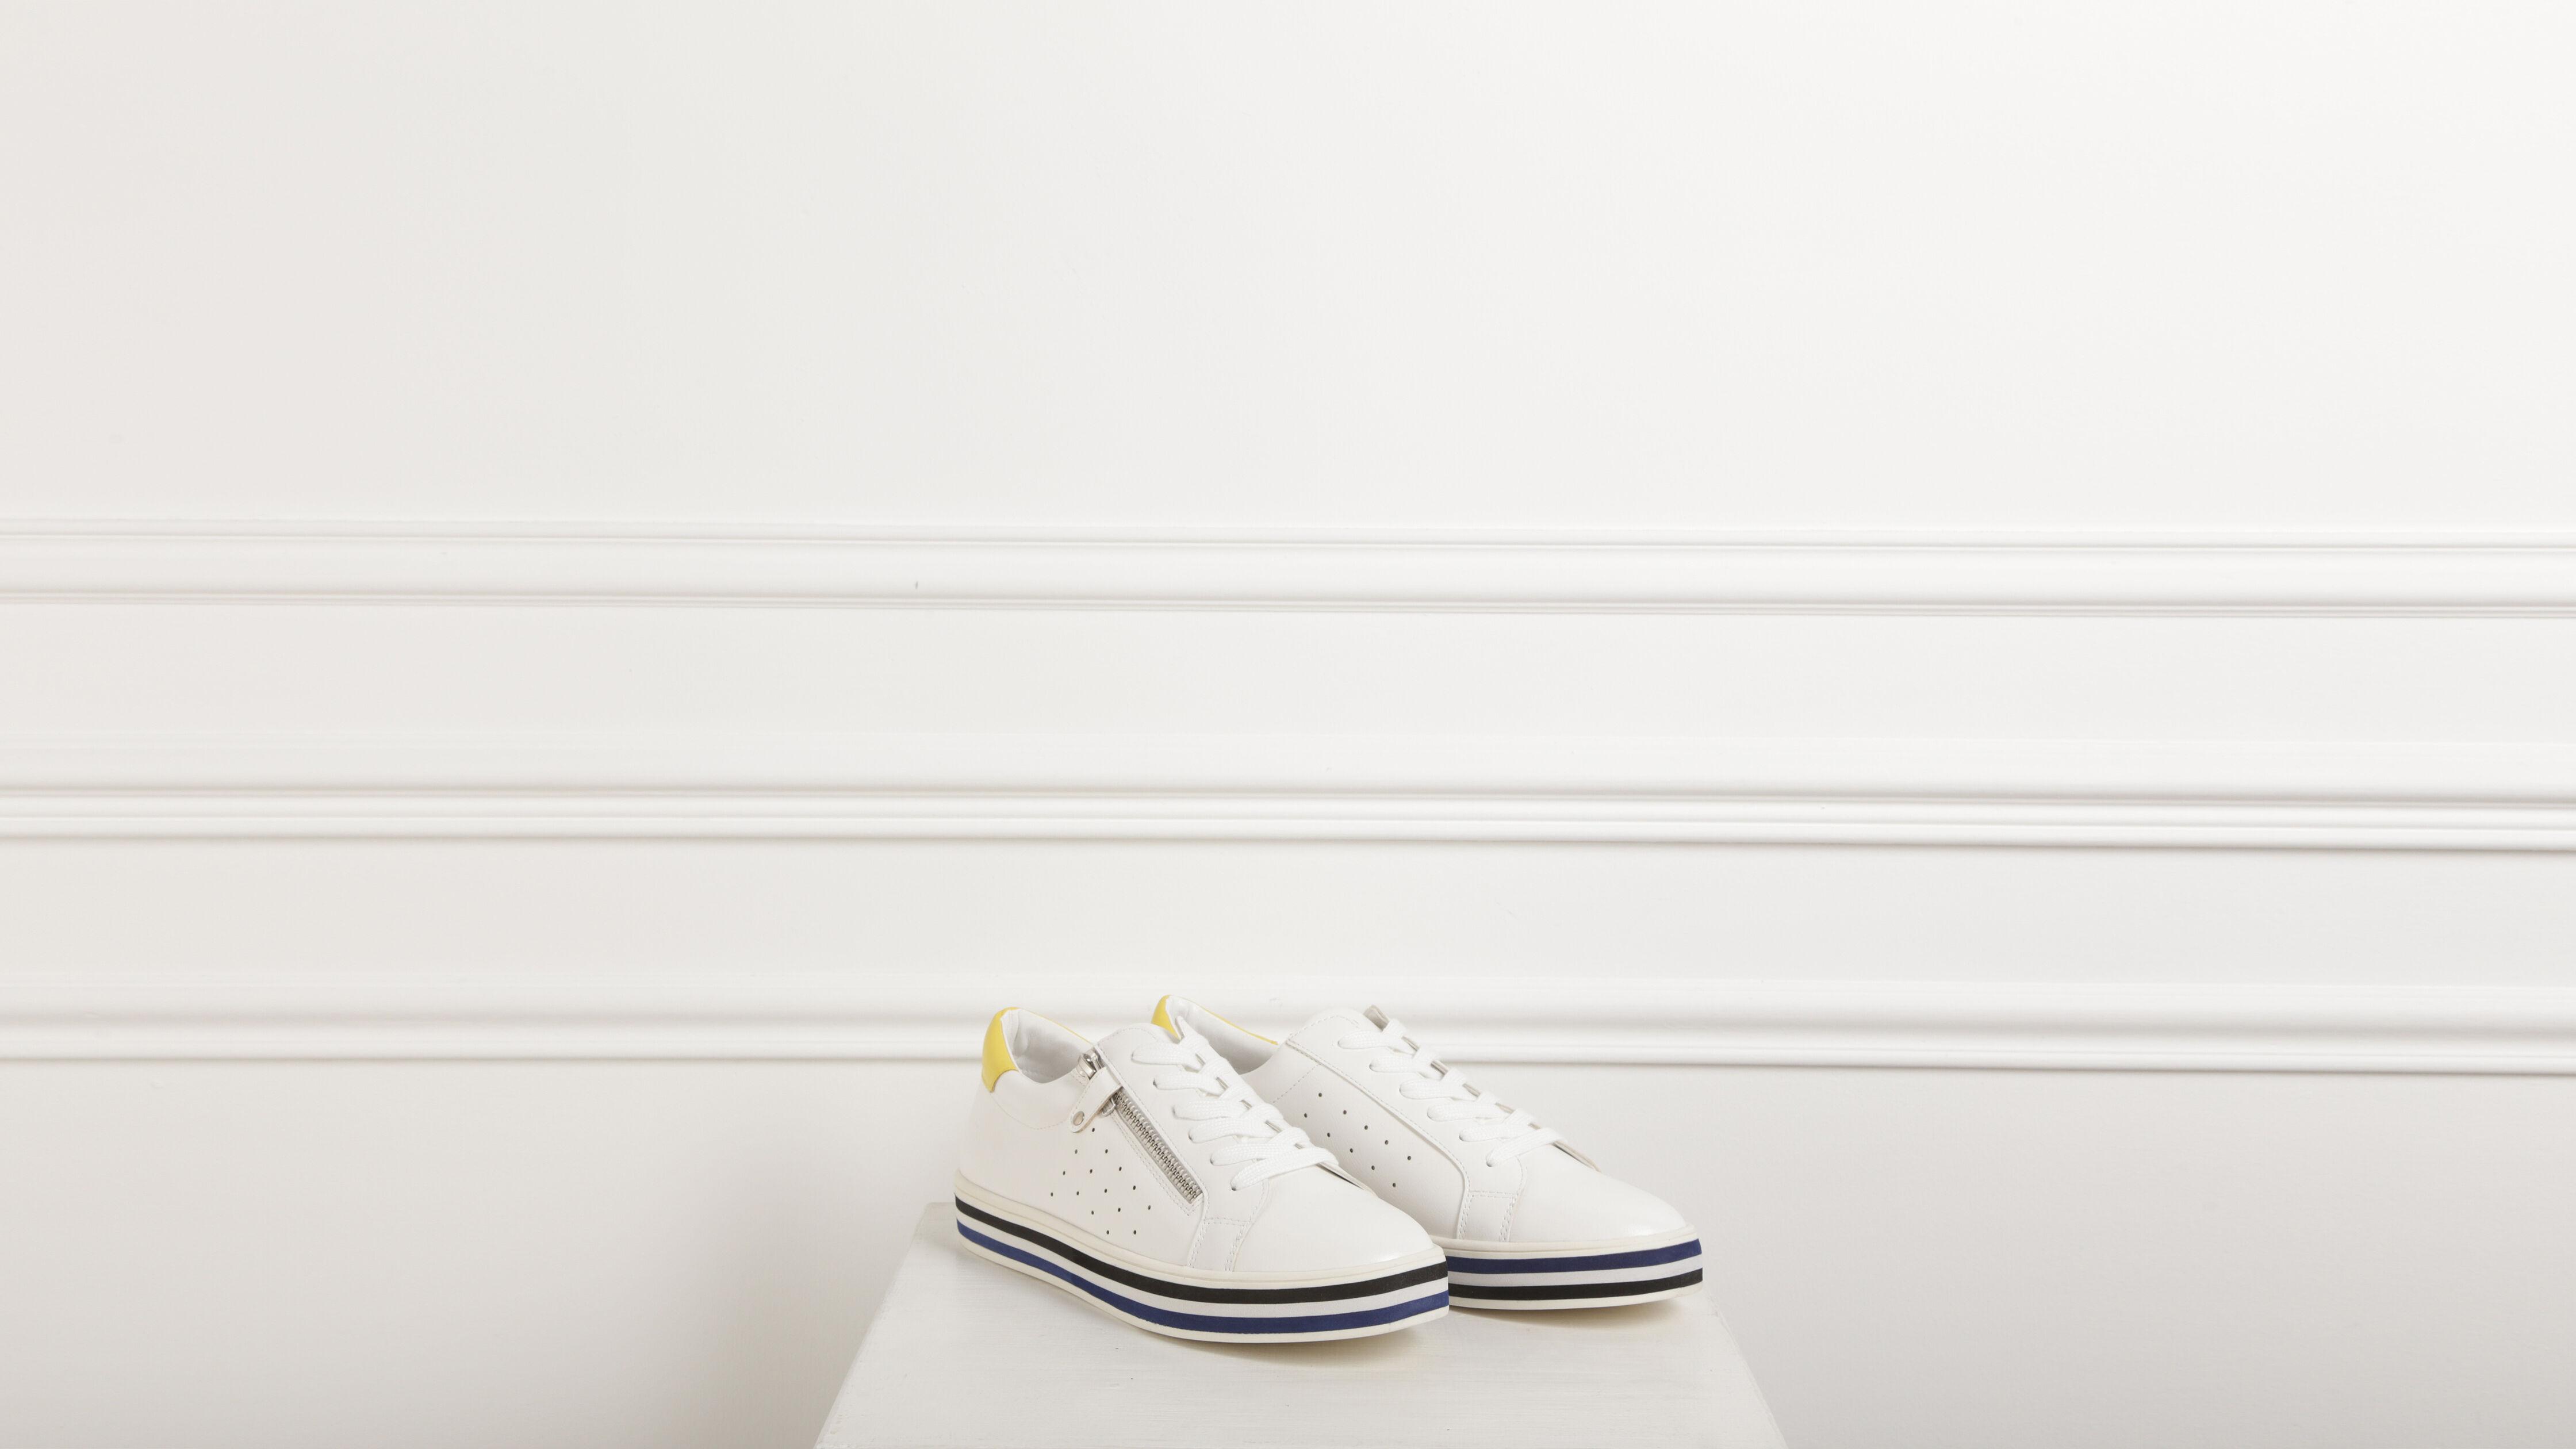 Mode Blanc 41 FemmeVib's Mode Vêtements Blanc 41 Vêtements Vêtements FemmeVib's Blanc Mode hQdCtsxr